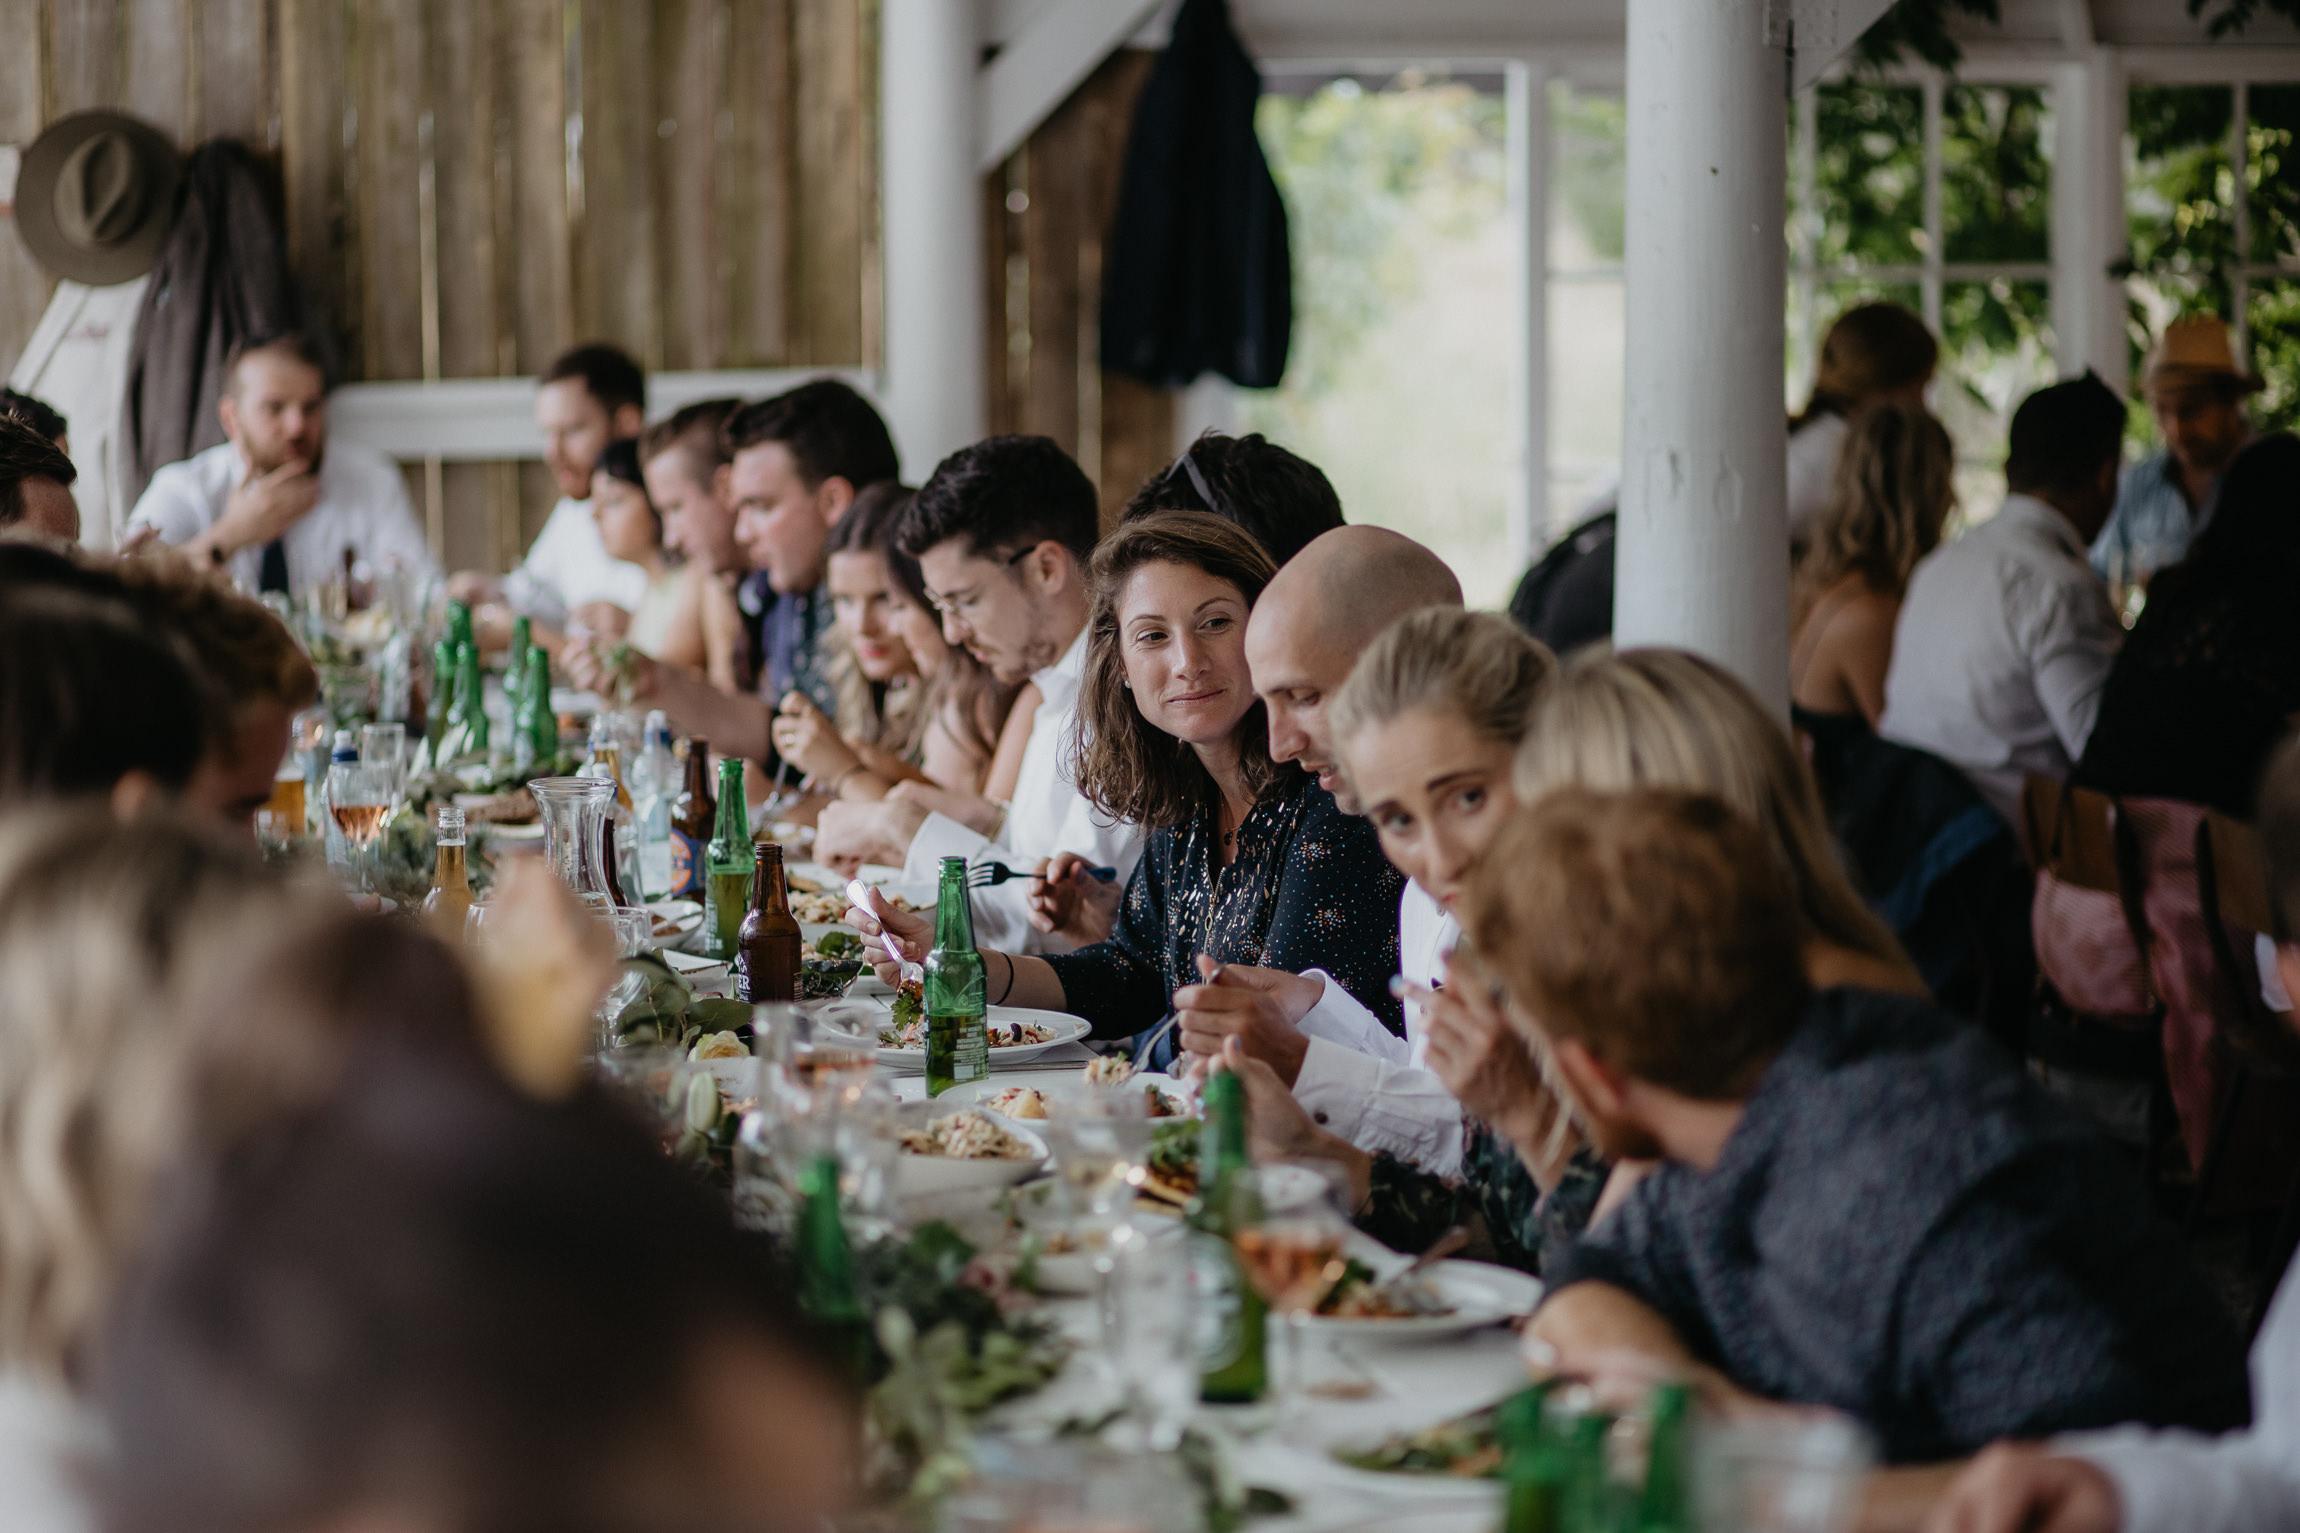 oldforestschool-wedding-blog-157.jpg